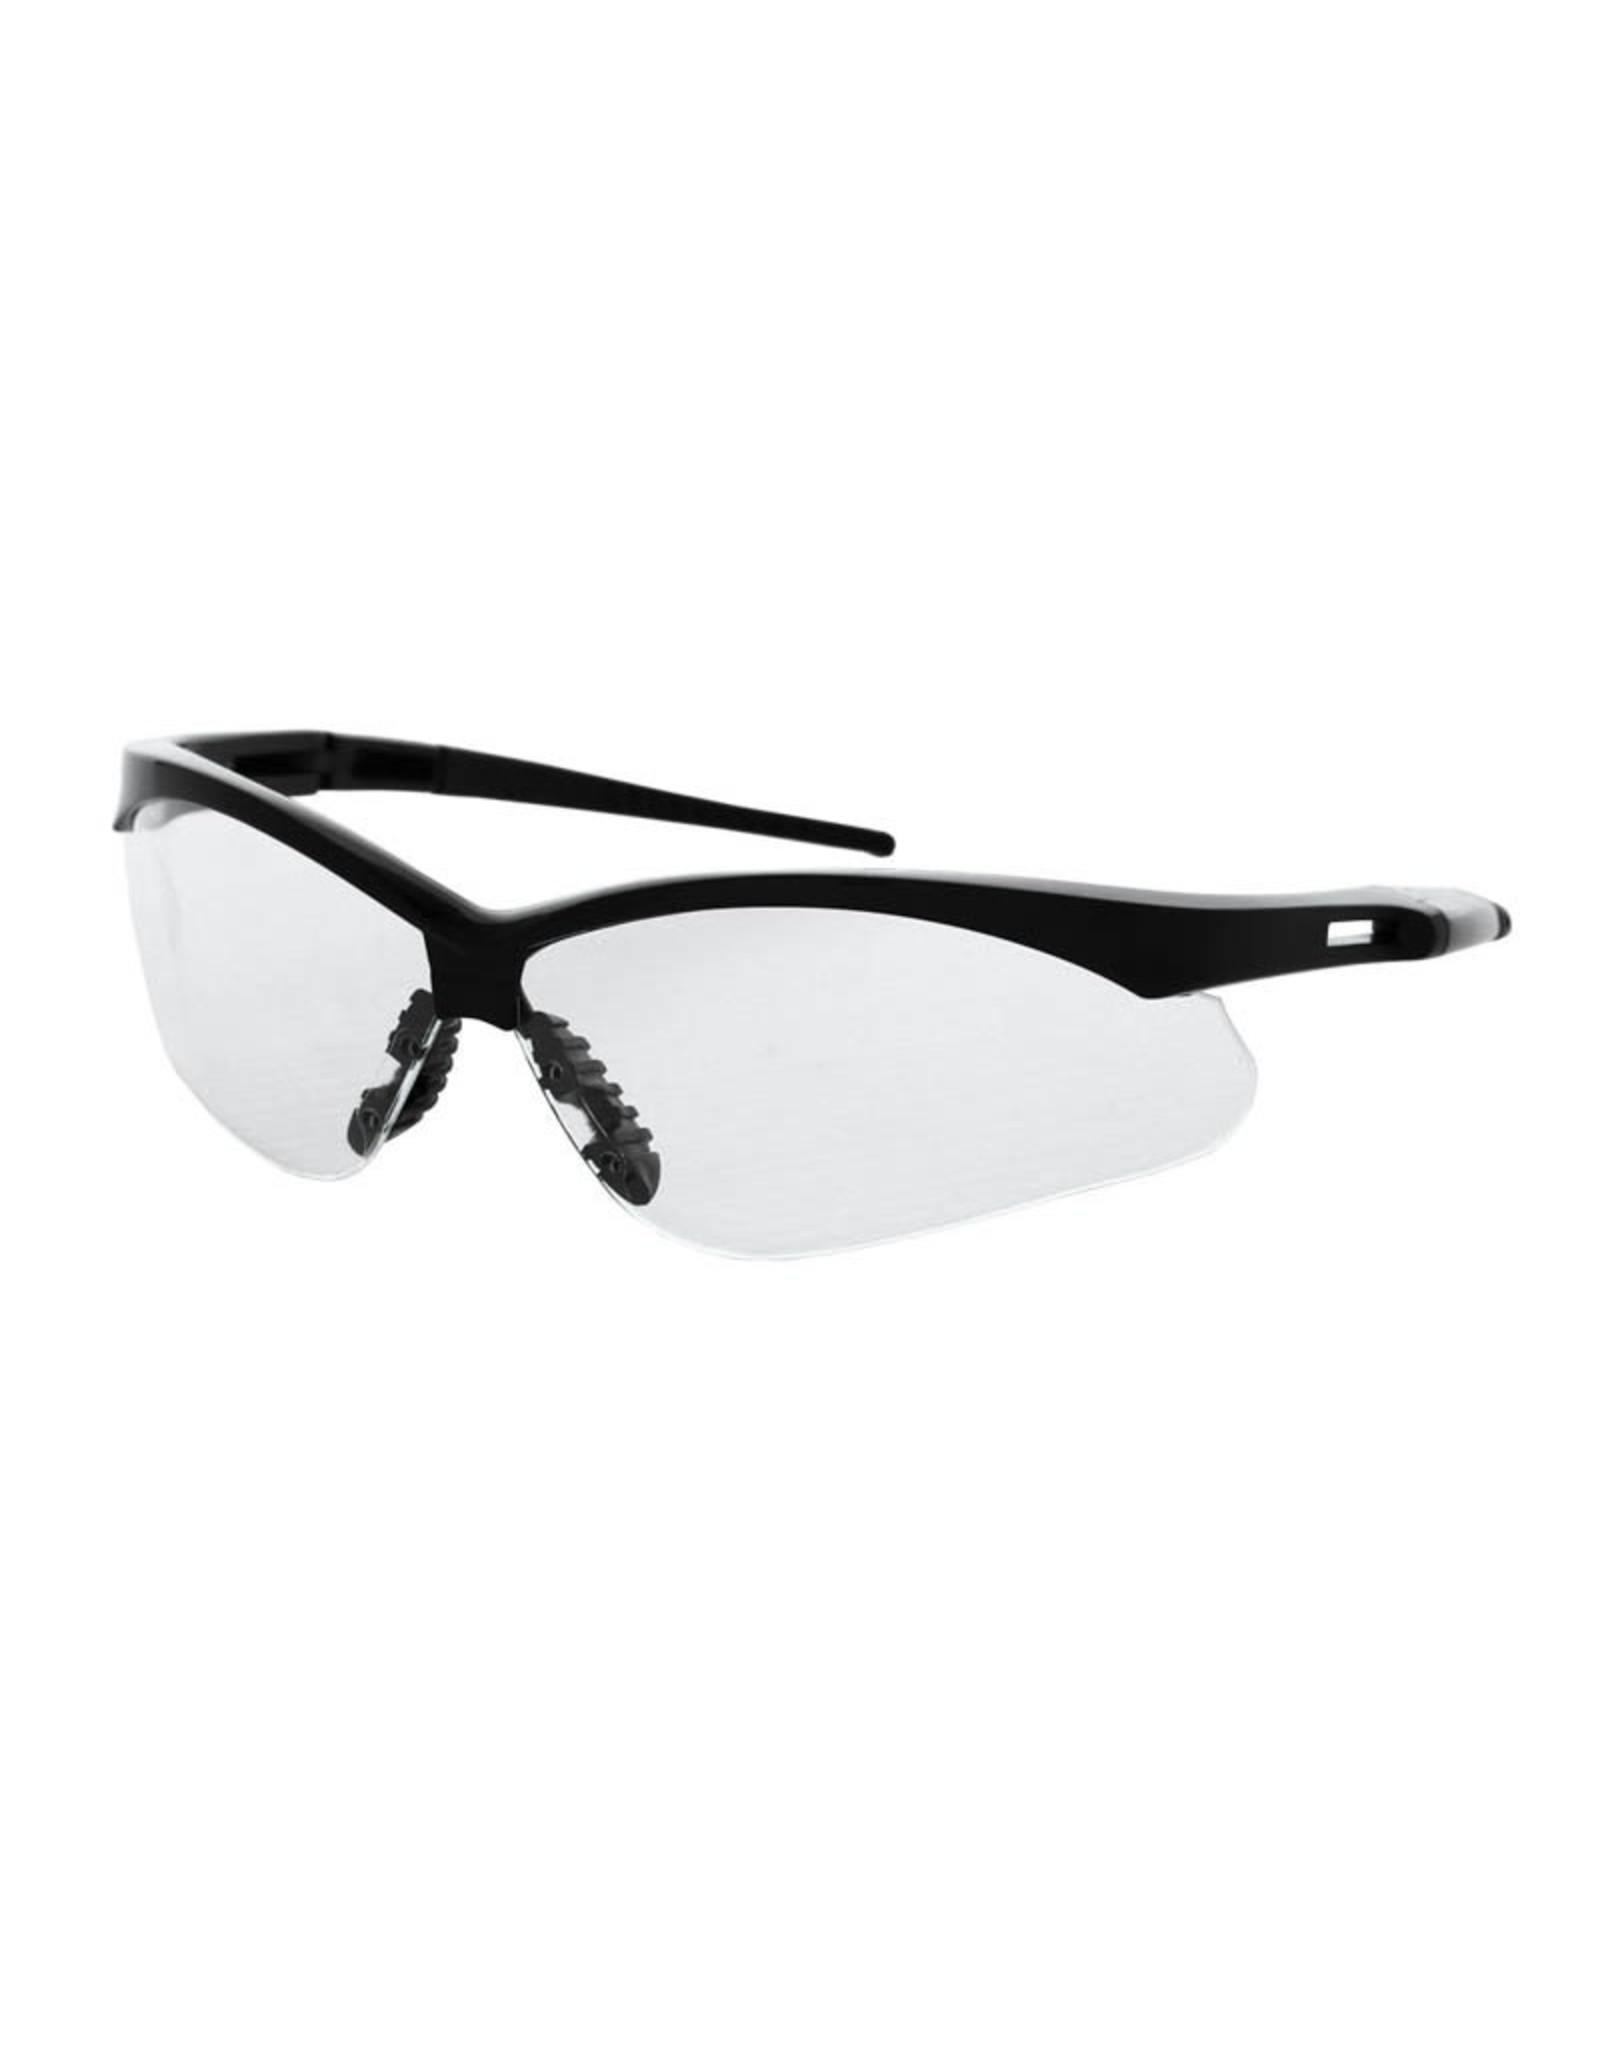 Majestic Glove Wrecker Safety Glasses ANSI Z87.1+, Hard Coated